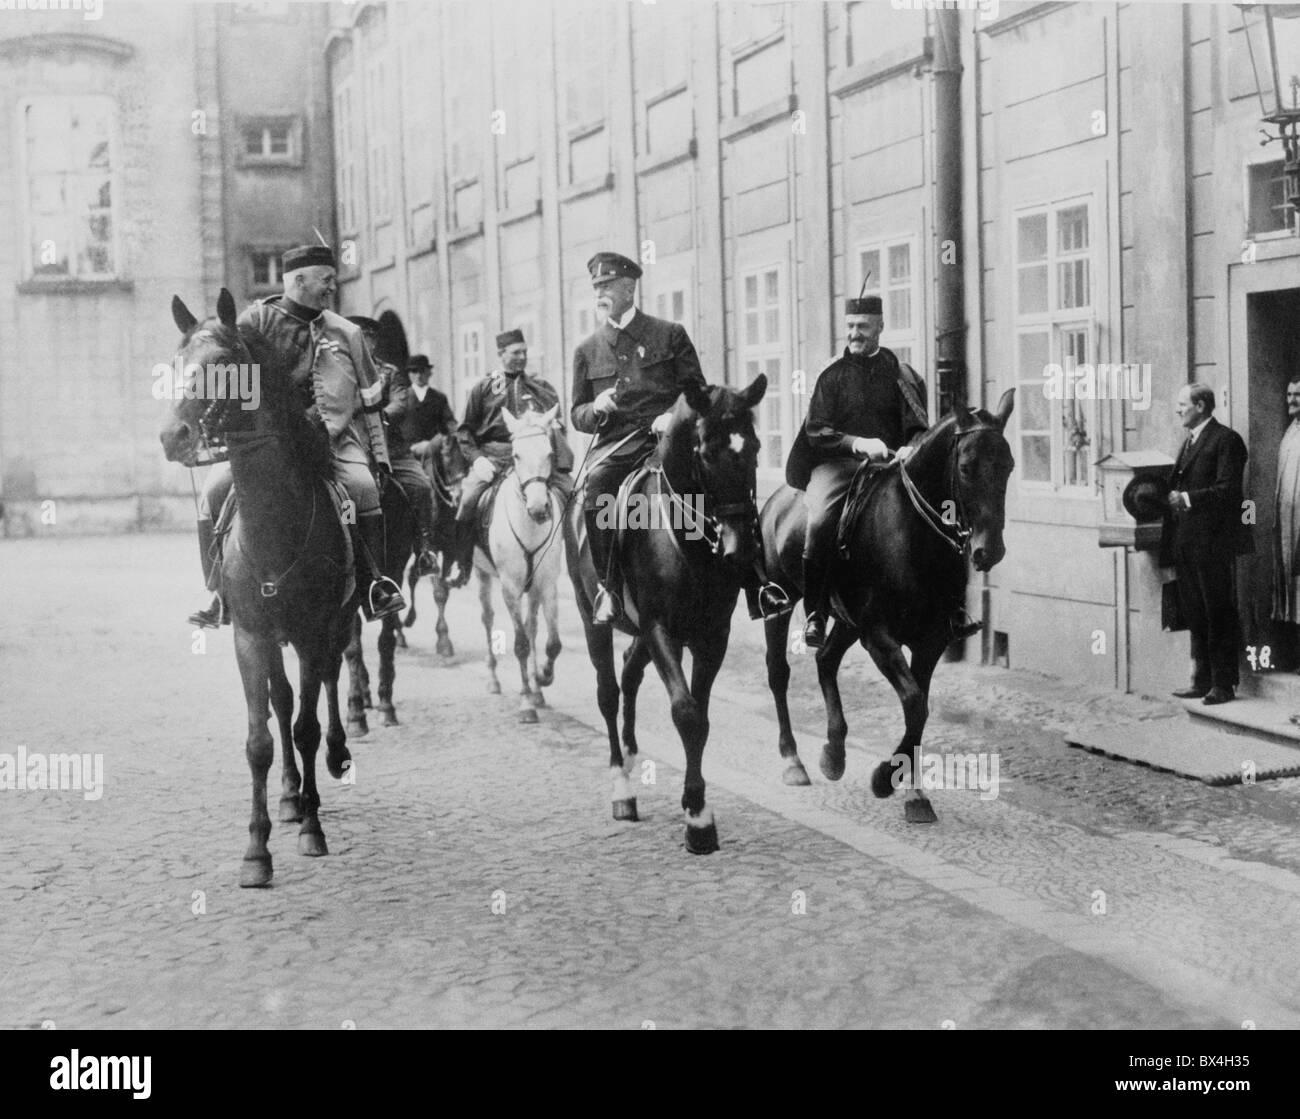 President Masaryk on horseback accompanied by Sokols. - Stock Image